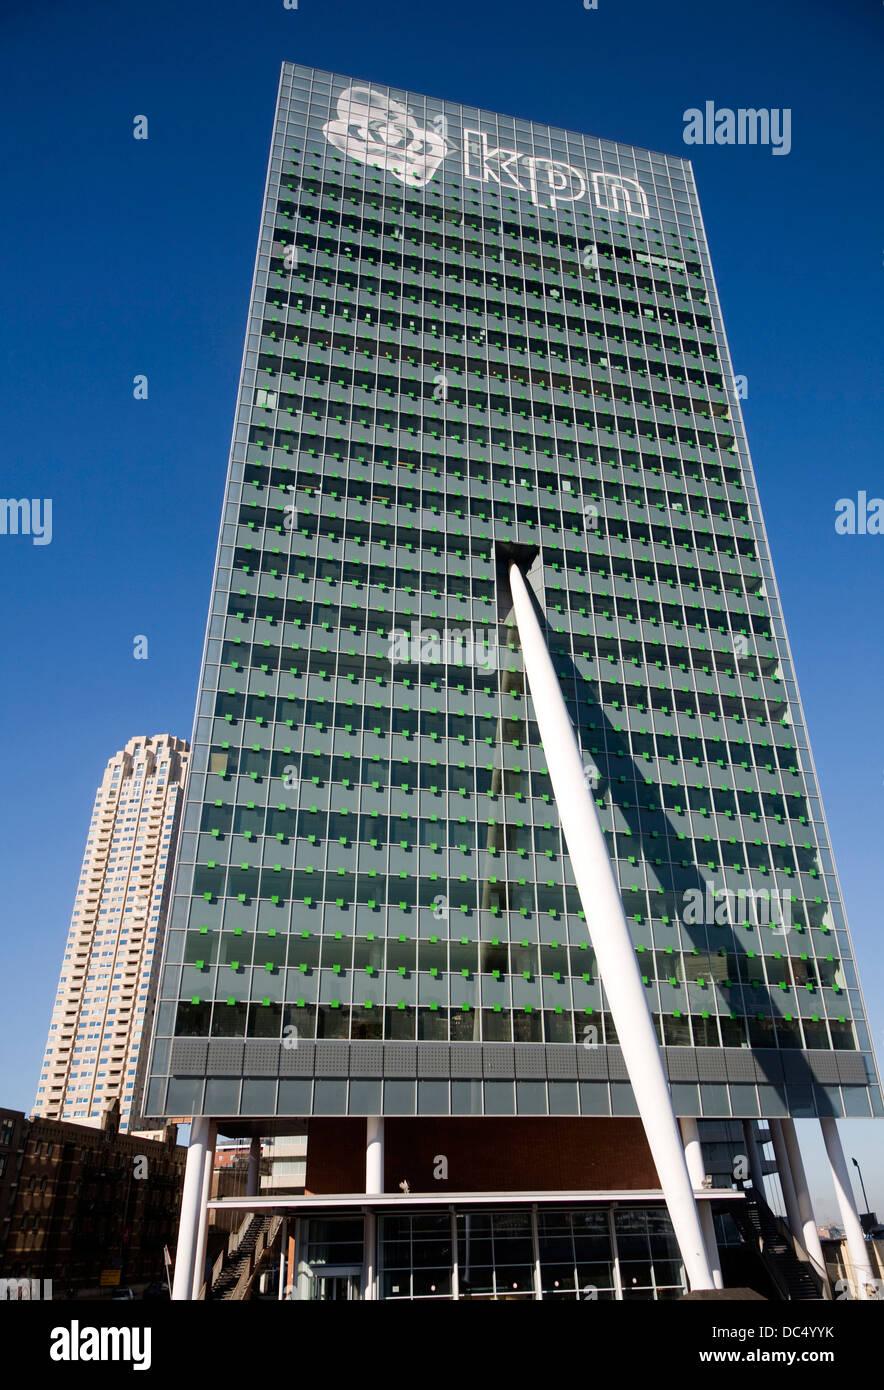 KPN building by Renzo Piano Rotterdam Netherlands - Stock Image